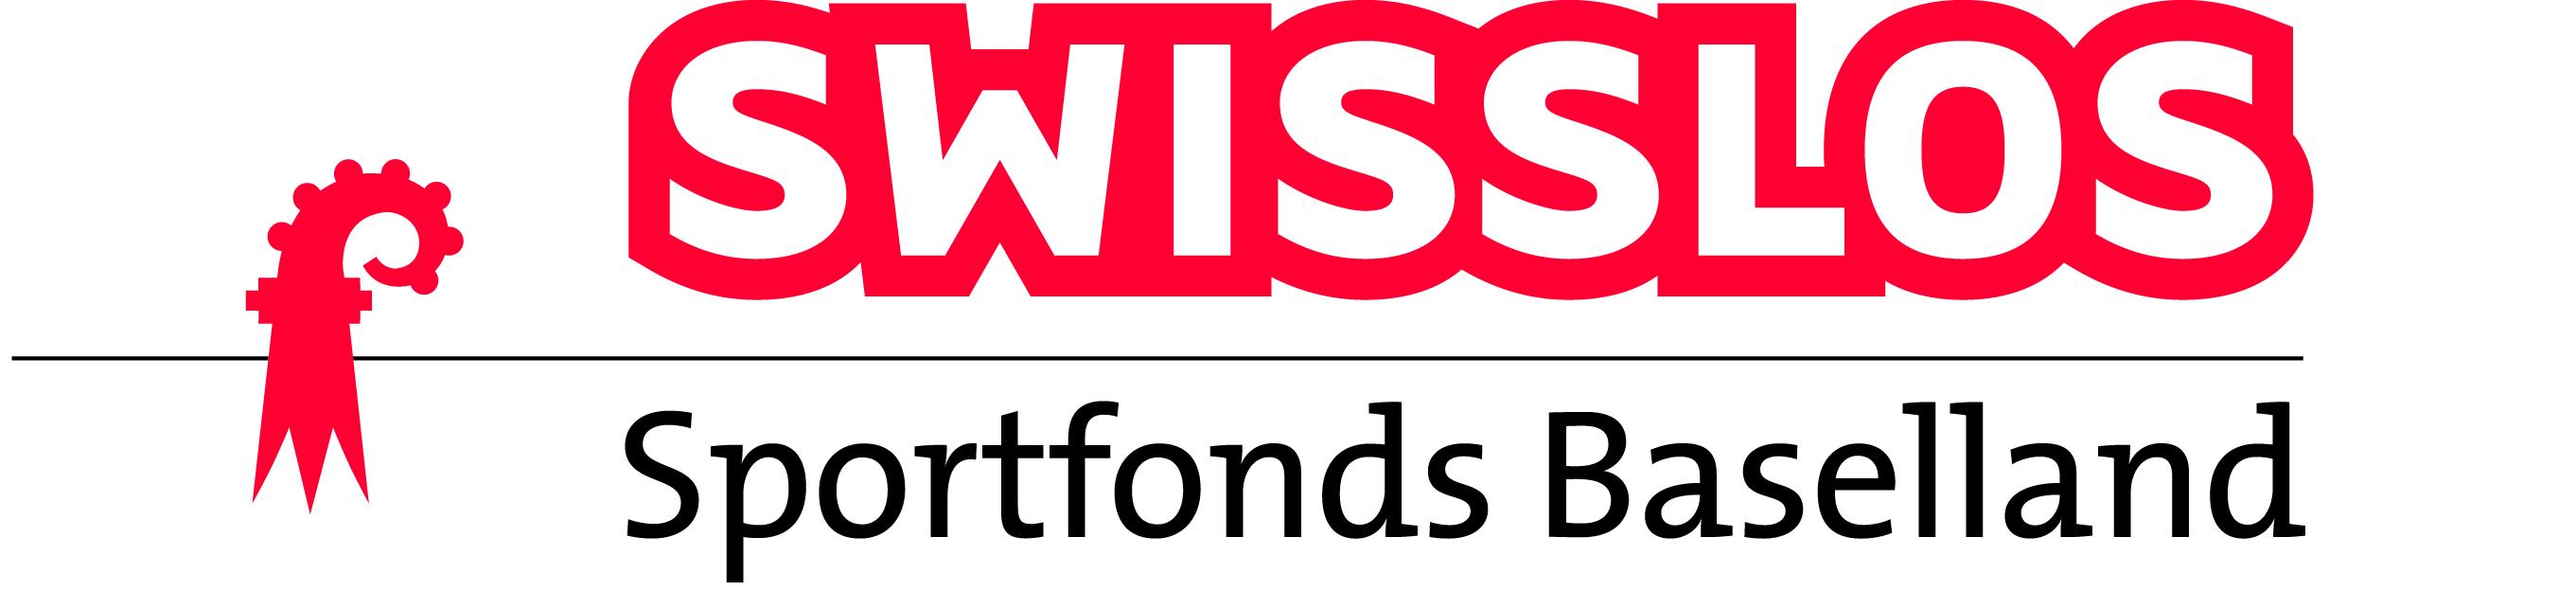 Swisslos - Sportamt Baselland